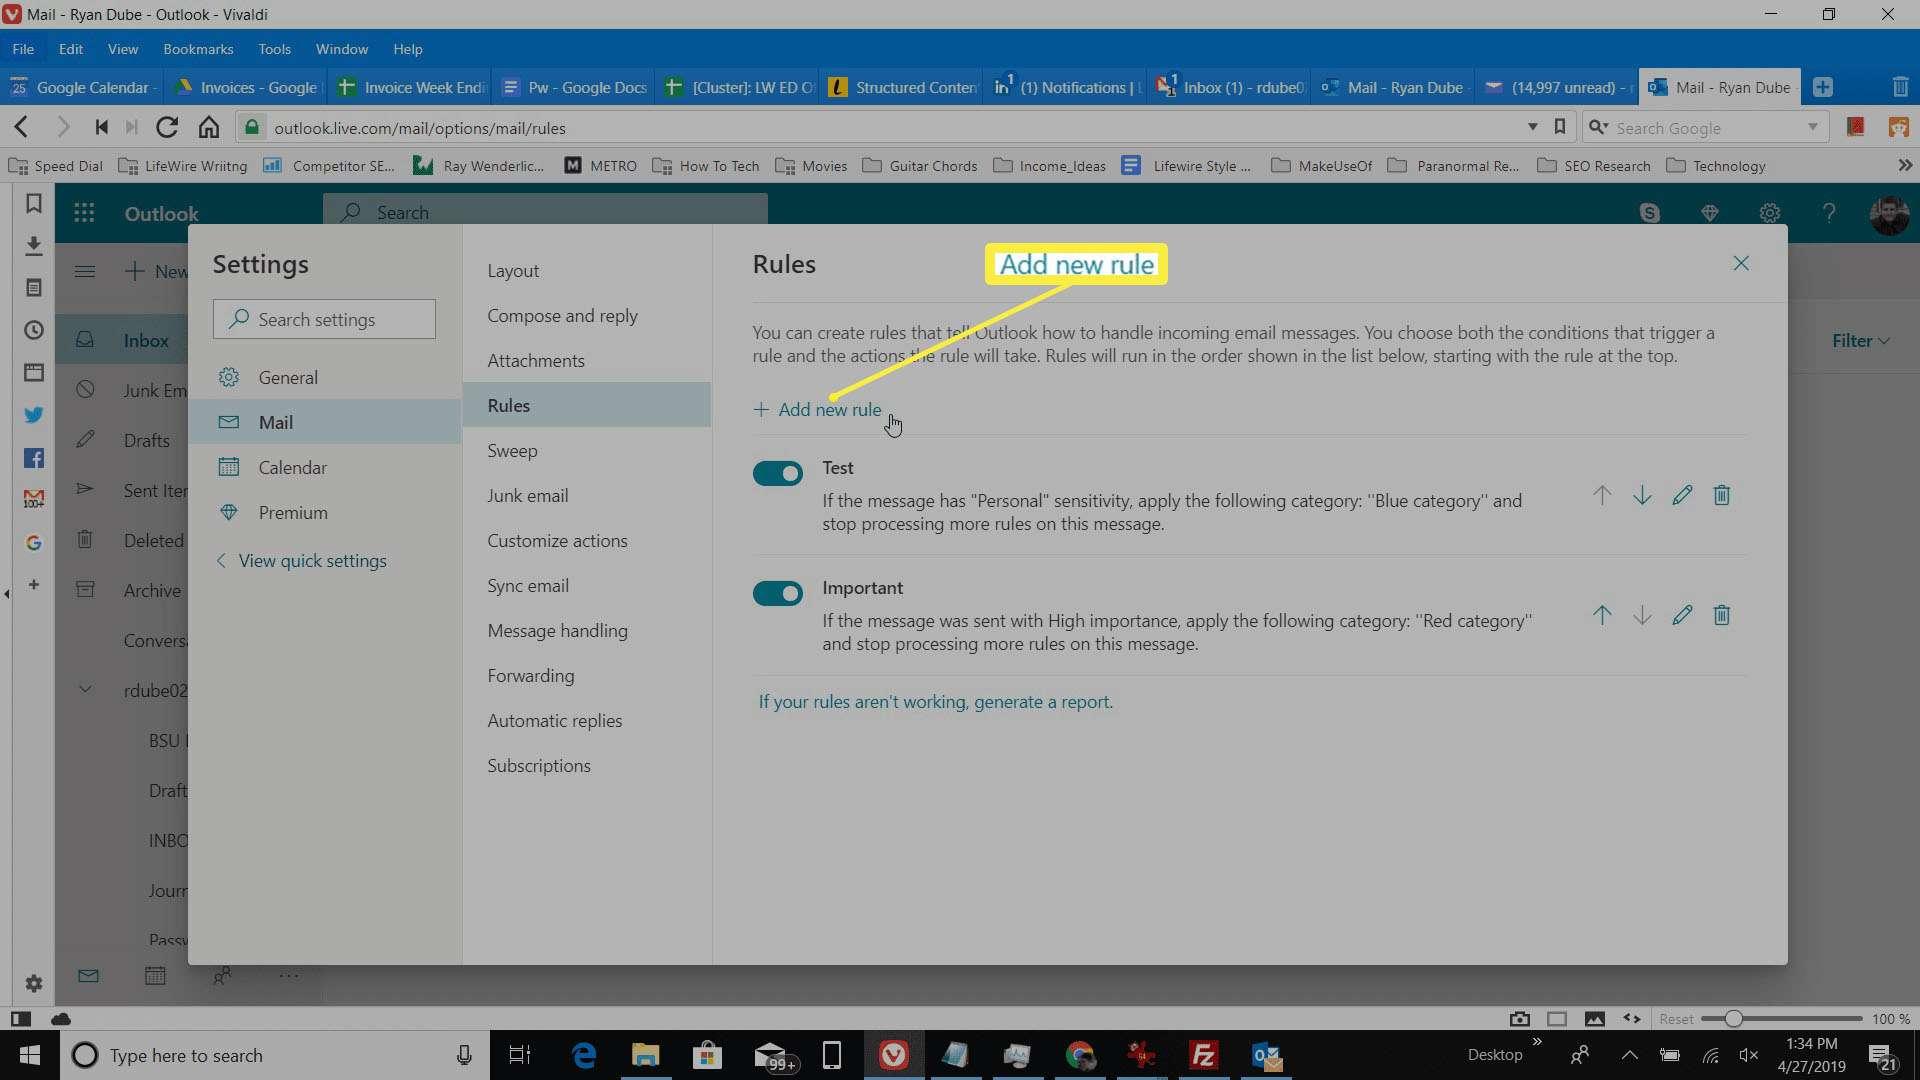 Screenshot of Add new rule in Outlook online.